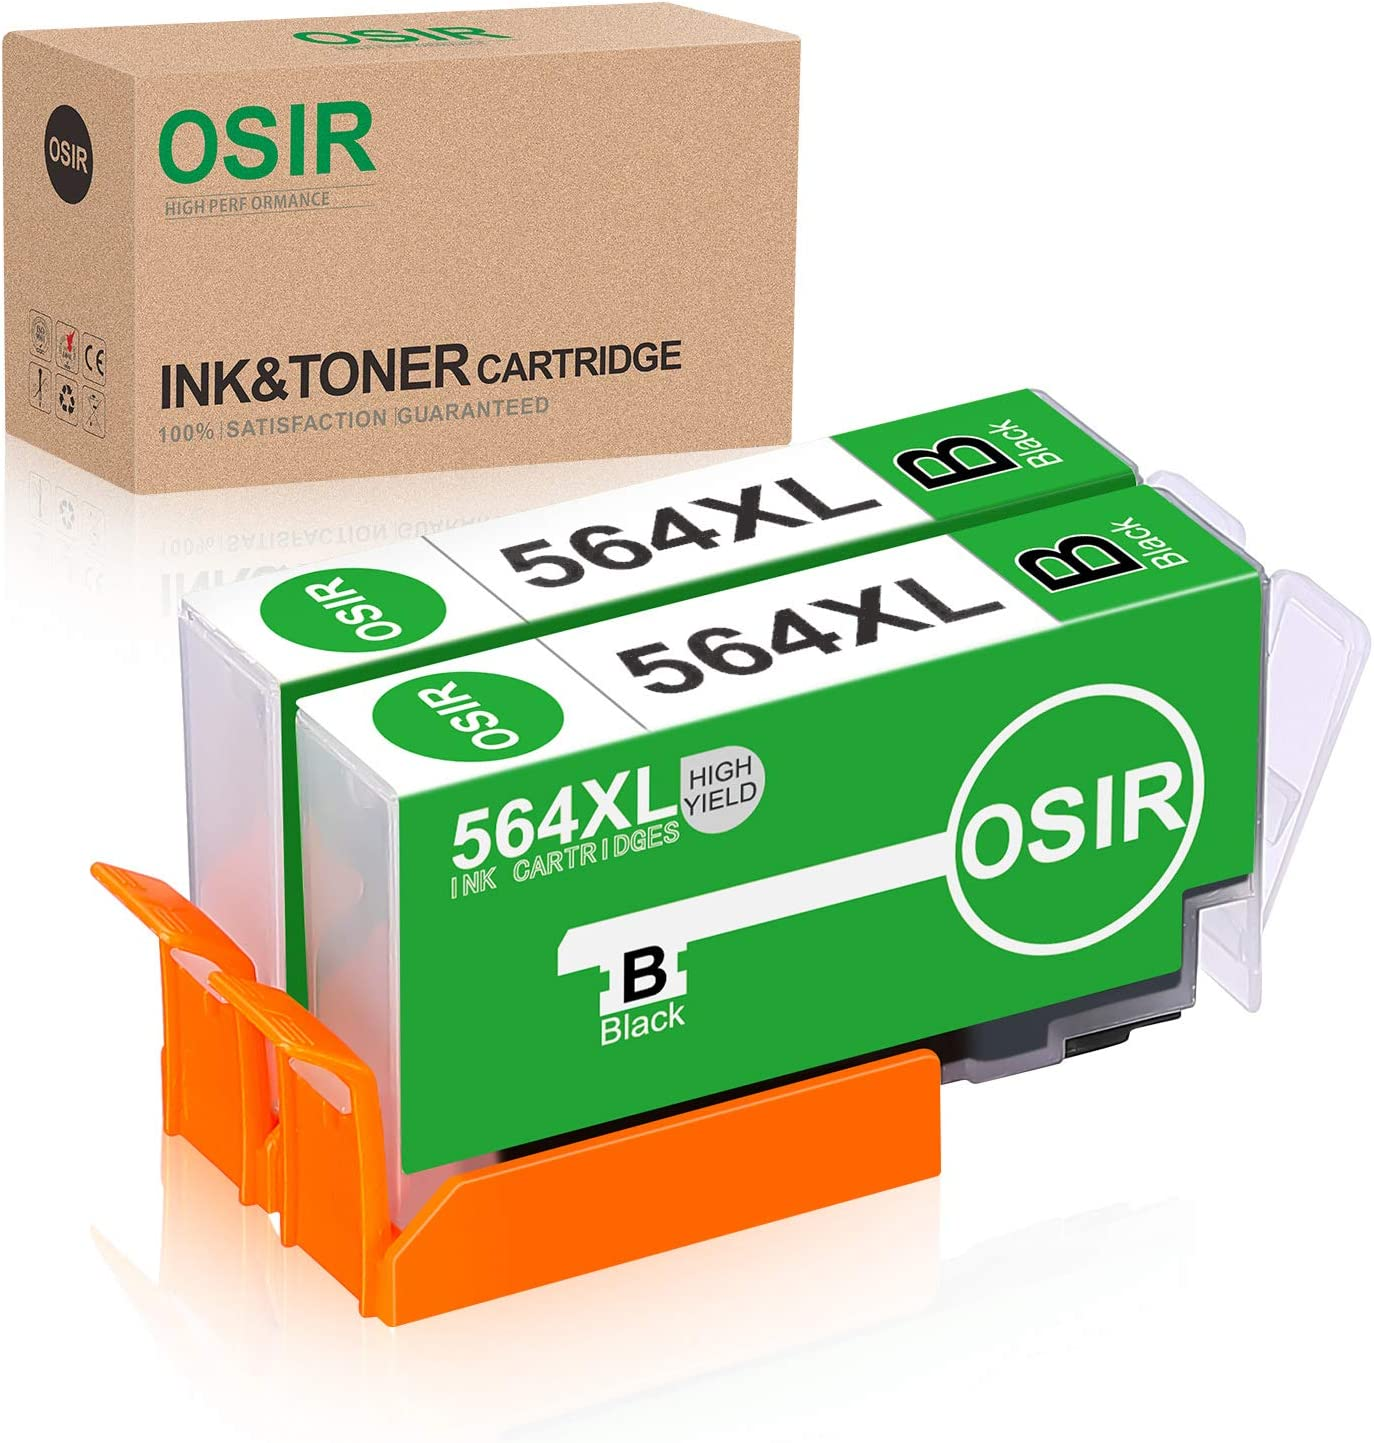 OSIR Compatible Ink Cartridge Replacement for HP 564 564XL for HP Photosmart 5520 5514 6510 6520 7510 5510 7525 7520 7515 C6380 C310a C309a C410a Officejet 4620 4622 Deskjet 3520 3521 3522 (2-Black)